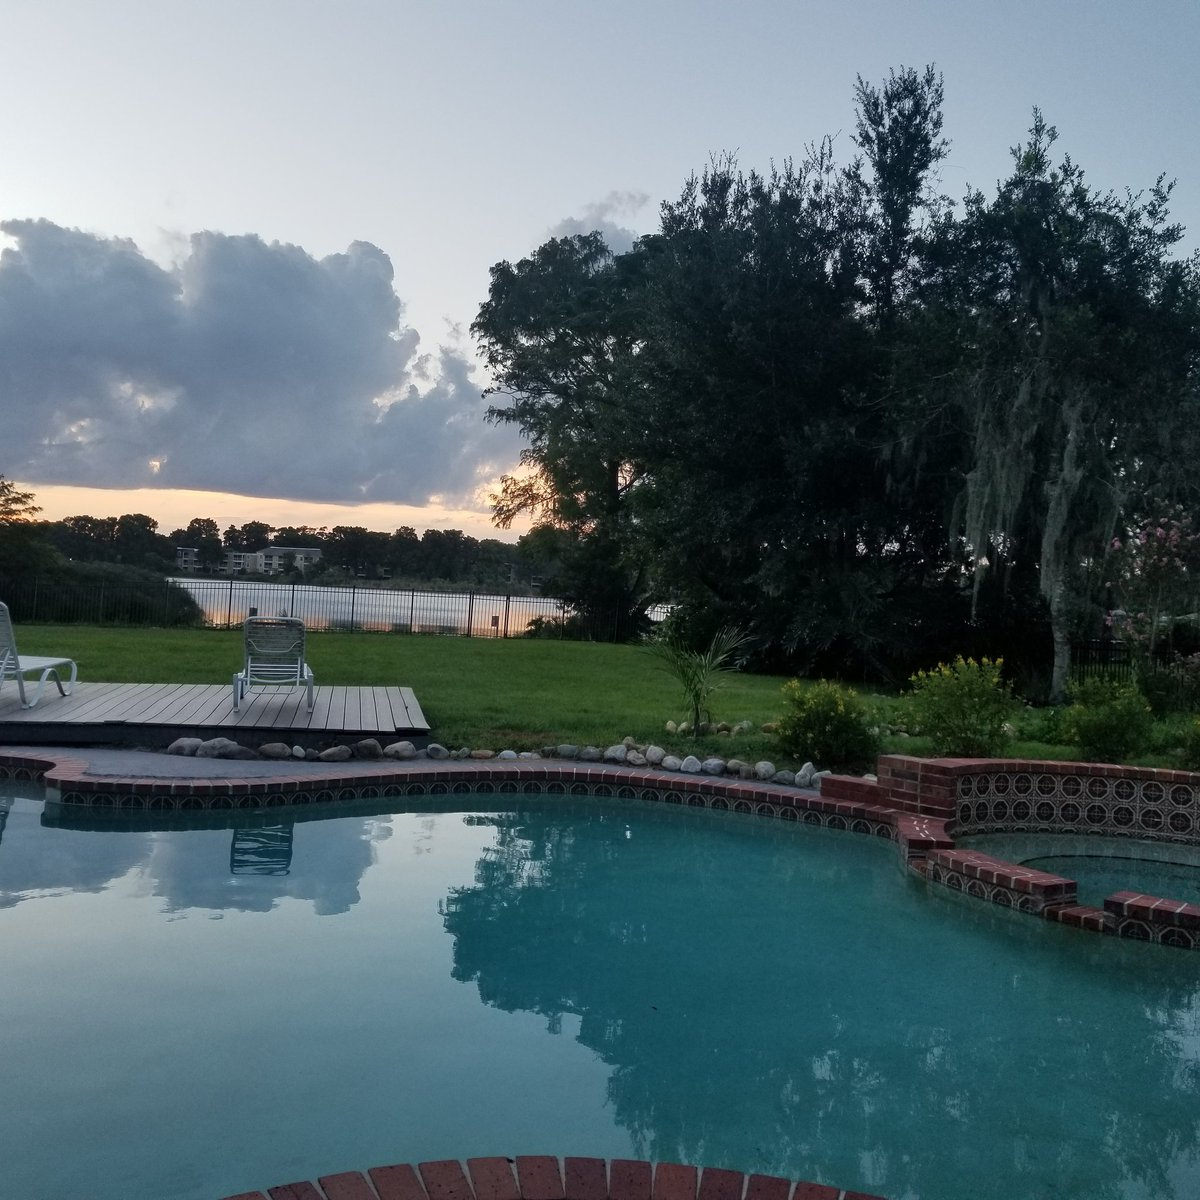 Enjoying this peaceful beautiful sunset #livingboldly #livingwithpurpose #livinginspired pic.twitter.com/v8mNsX5bYI